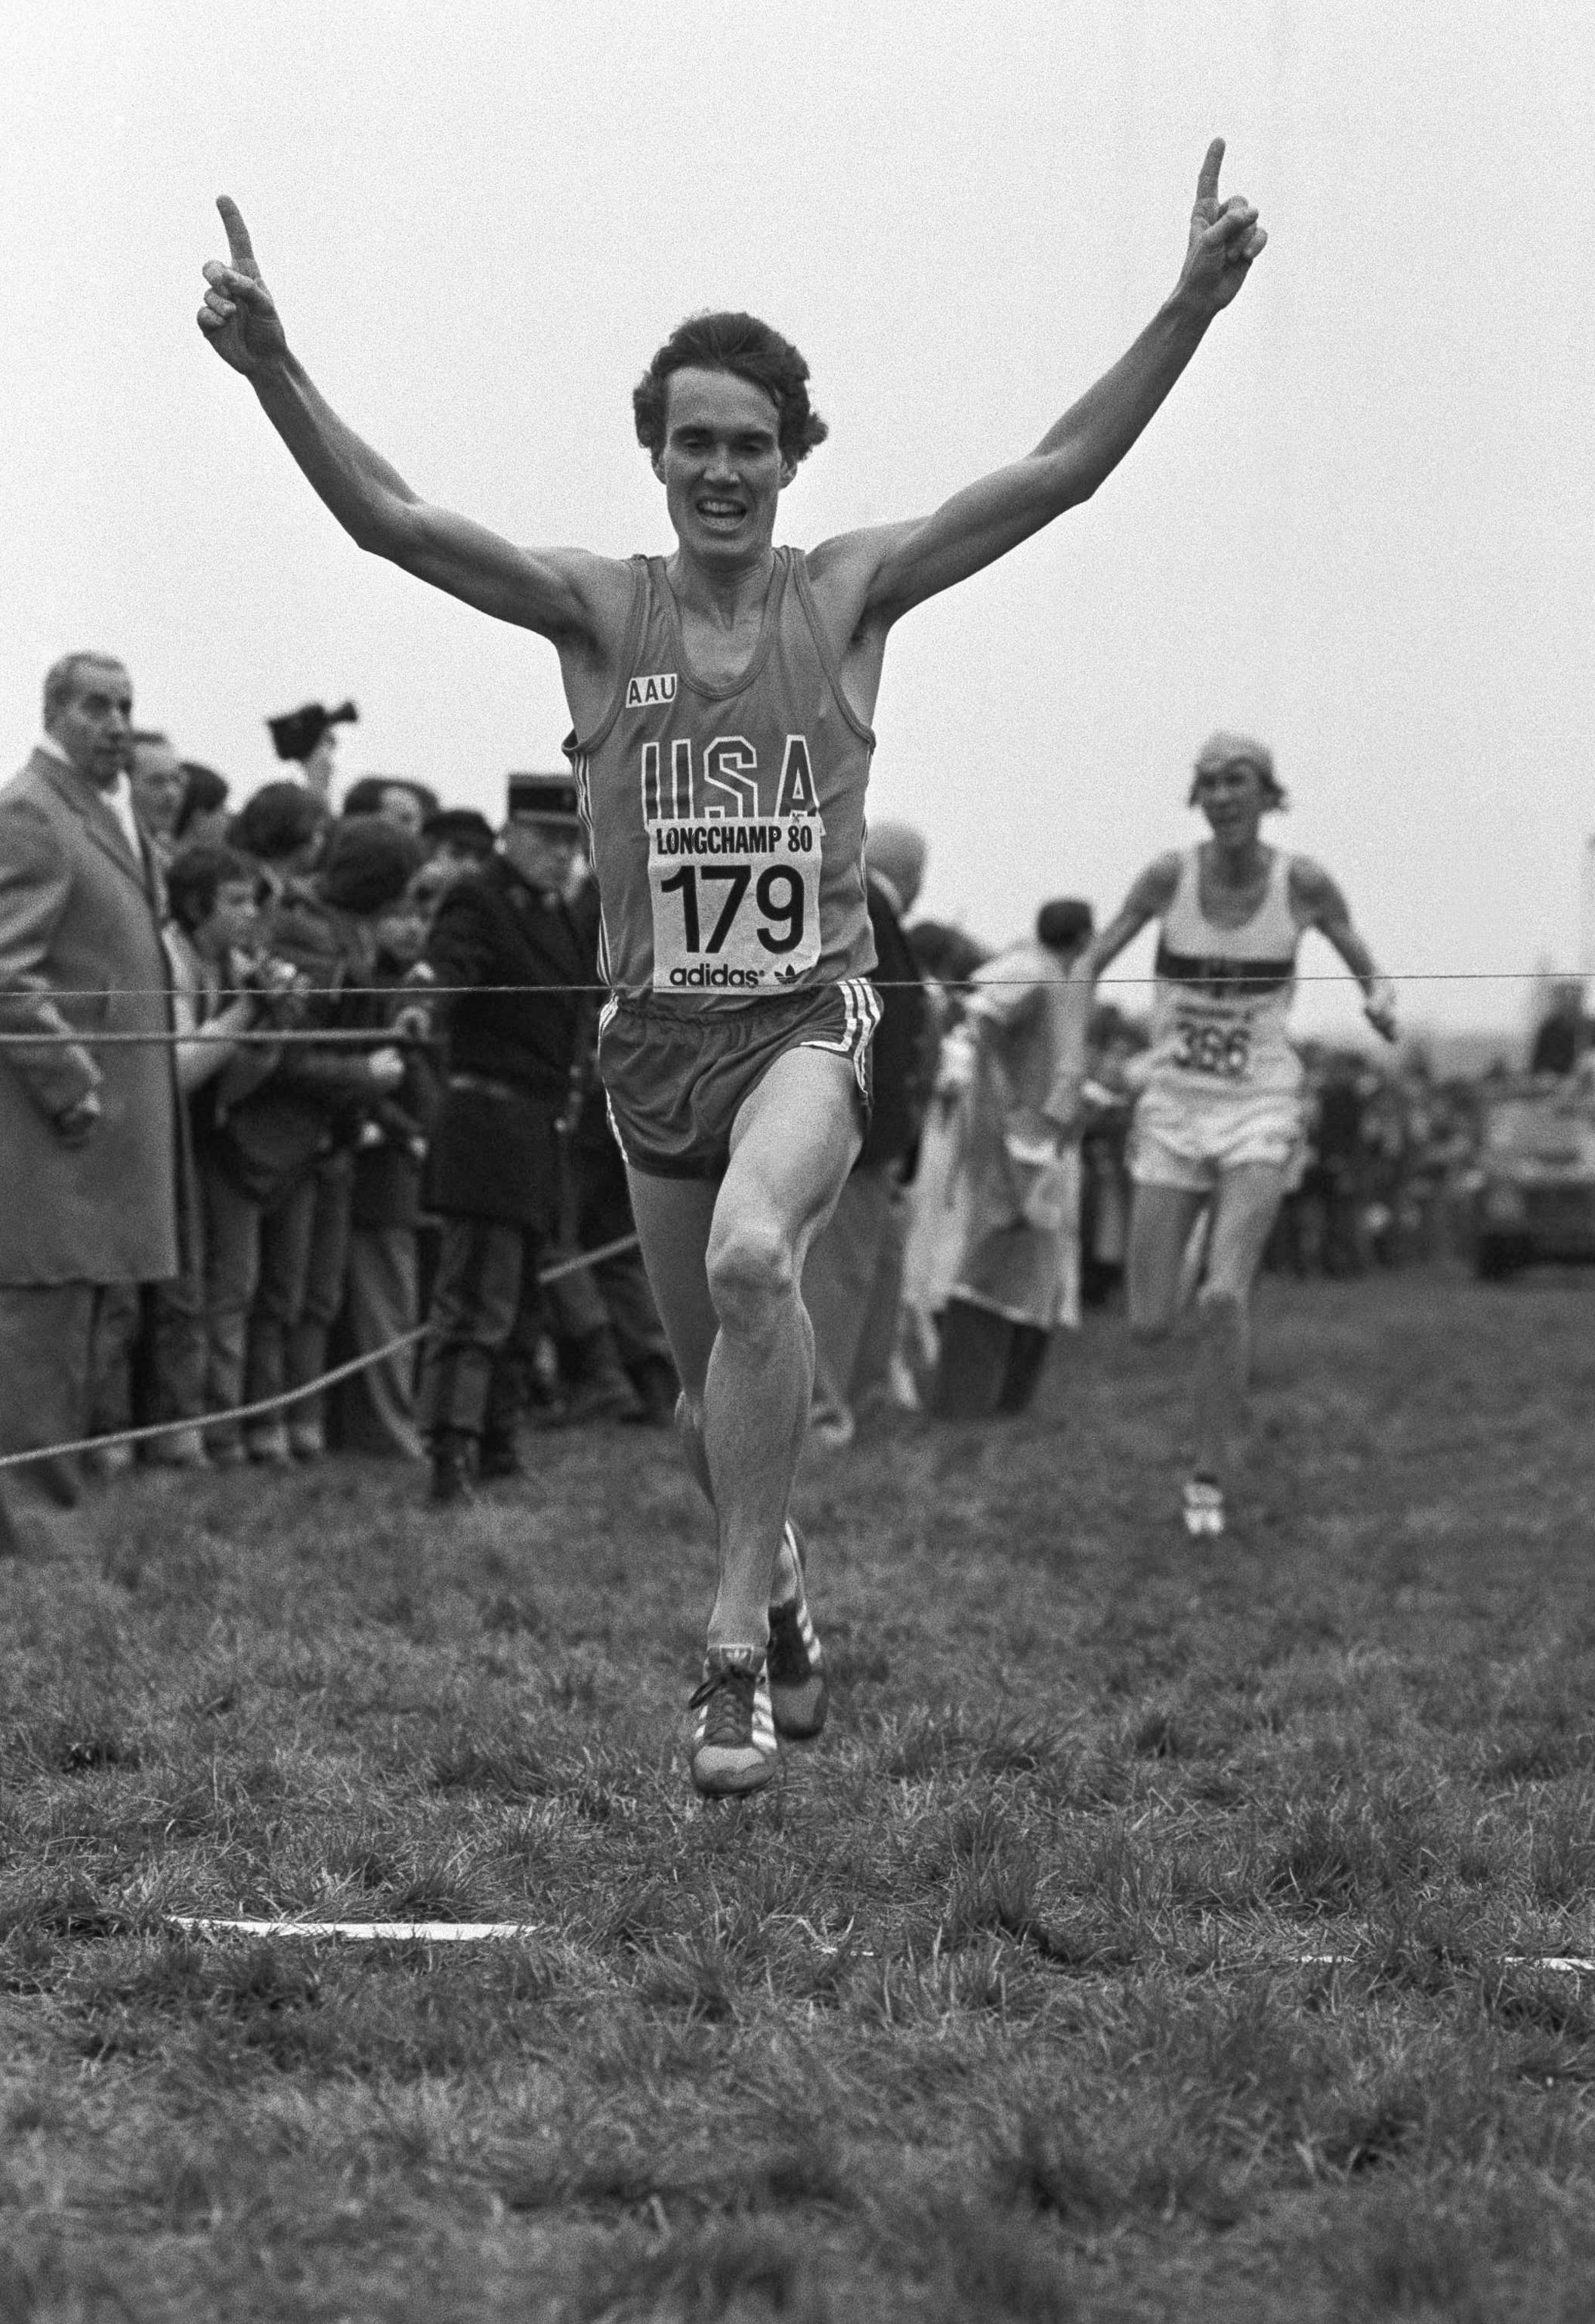 American Distance Legend Craig Virgin winning the 1980 World XC Championships.